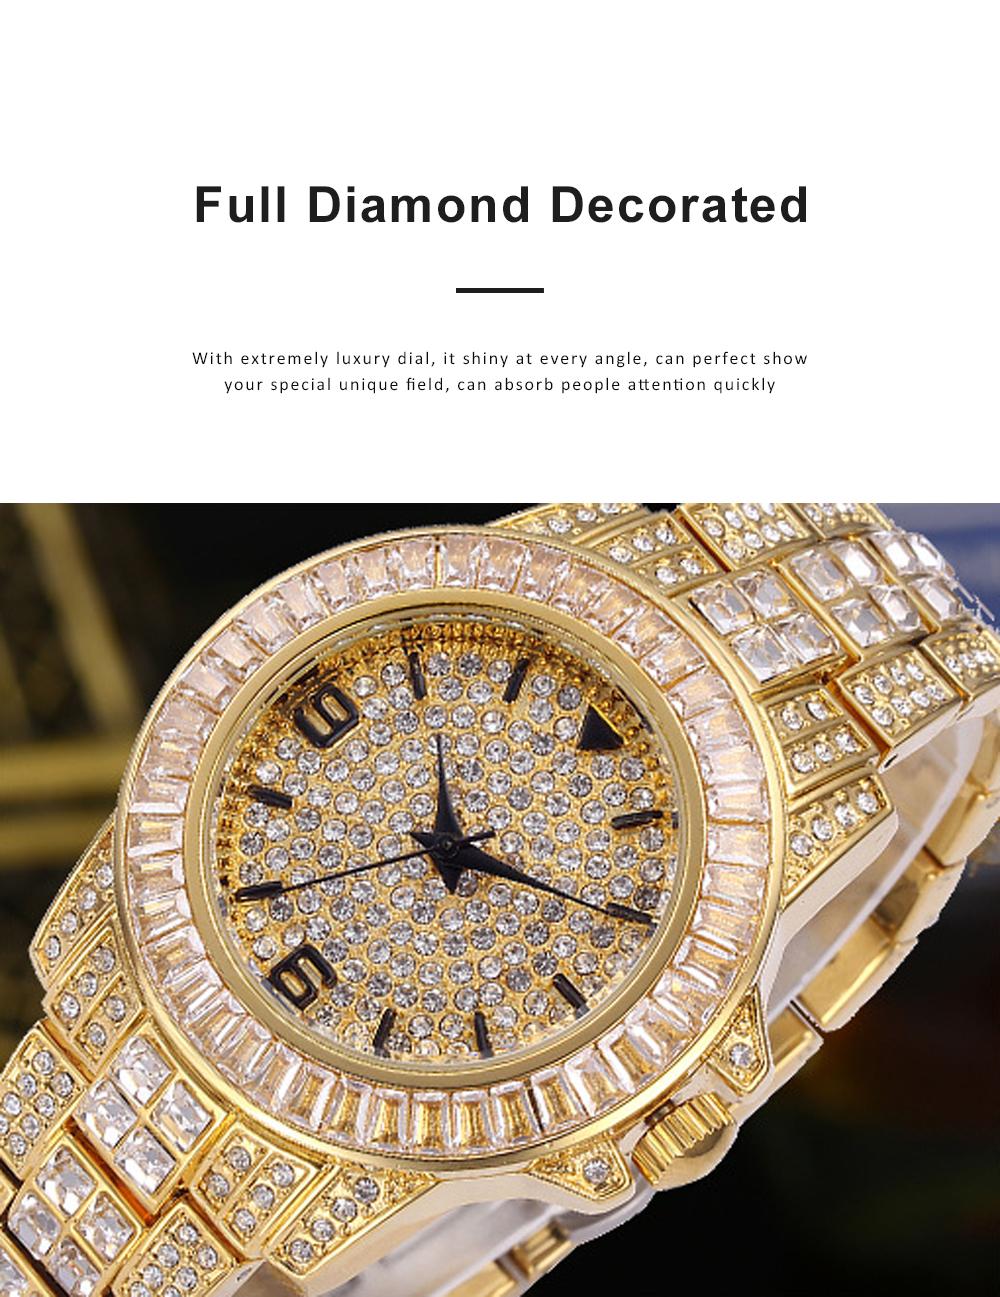 New Men Fashion Exquisite Waterproof Diamond Date Quartz Watch Gold Stainless Steel Business Luxury Mens Watches 5